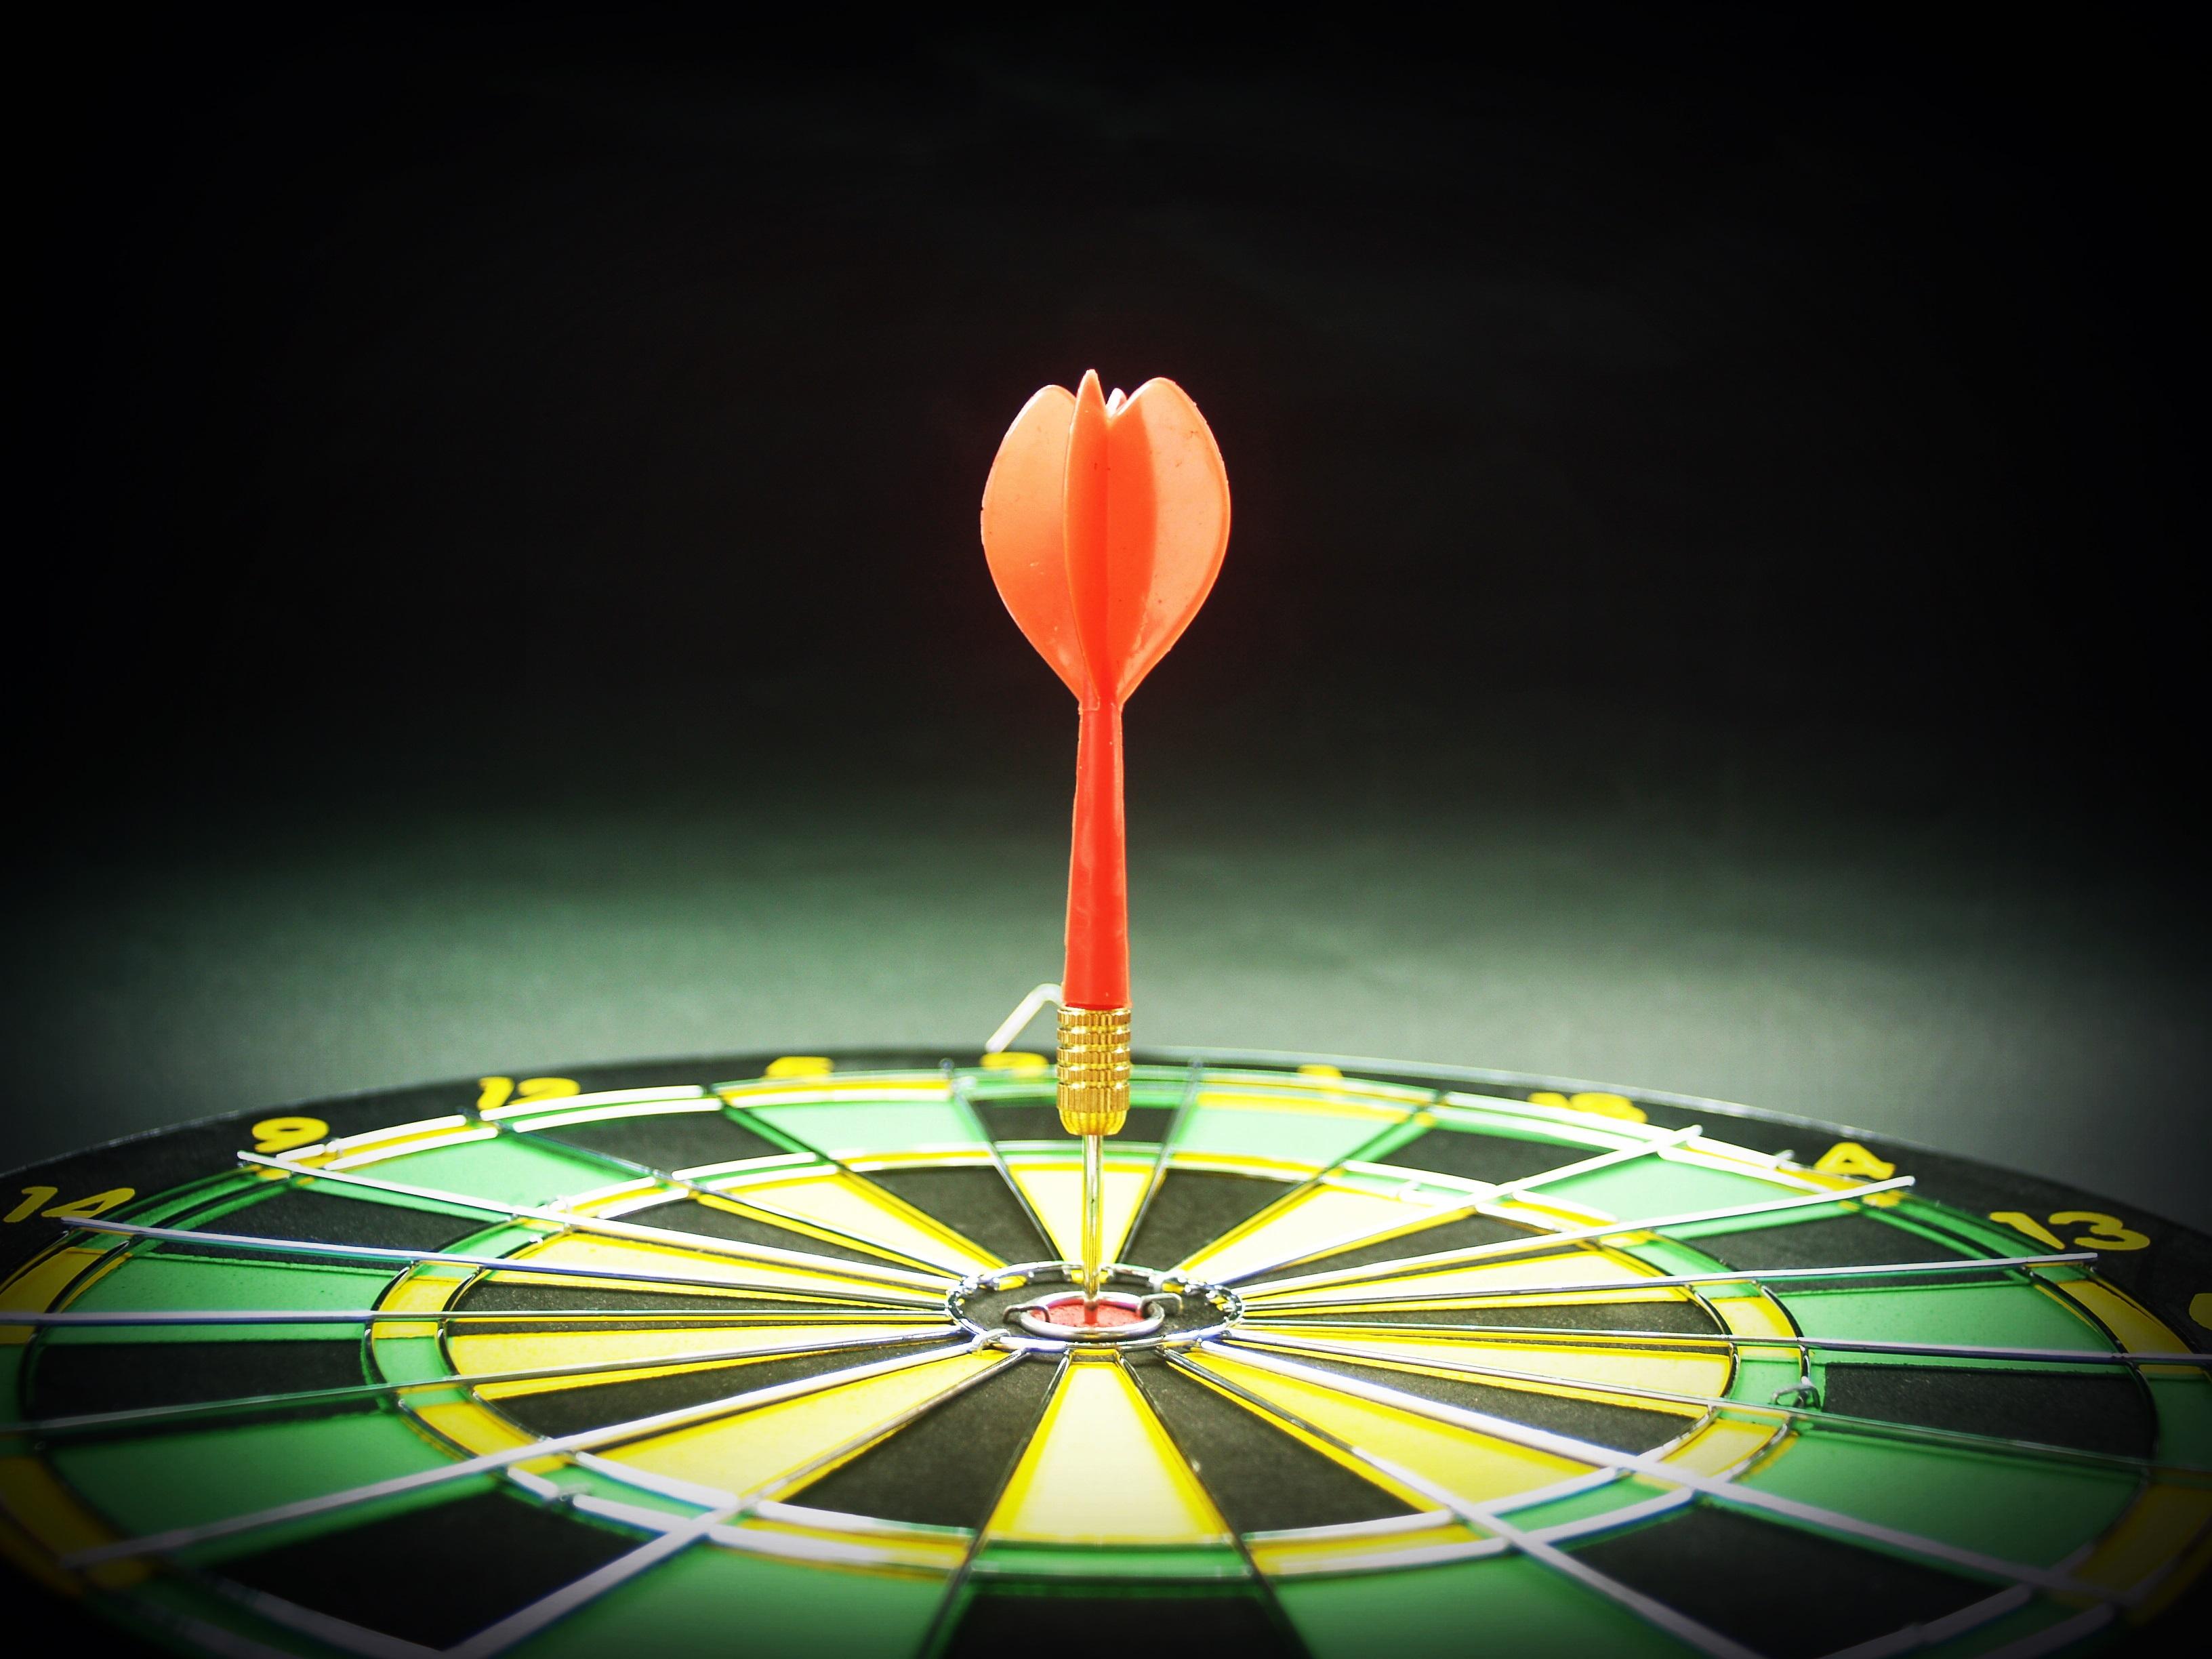 goal, goals, aspirations, goal setting, Stacia Robinson, The BeneChoice Companies, 2017